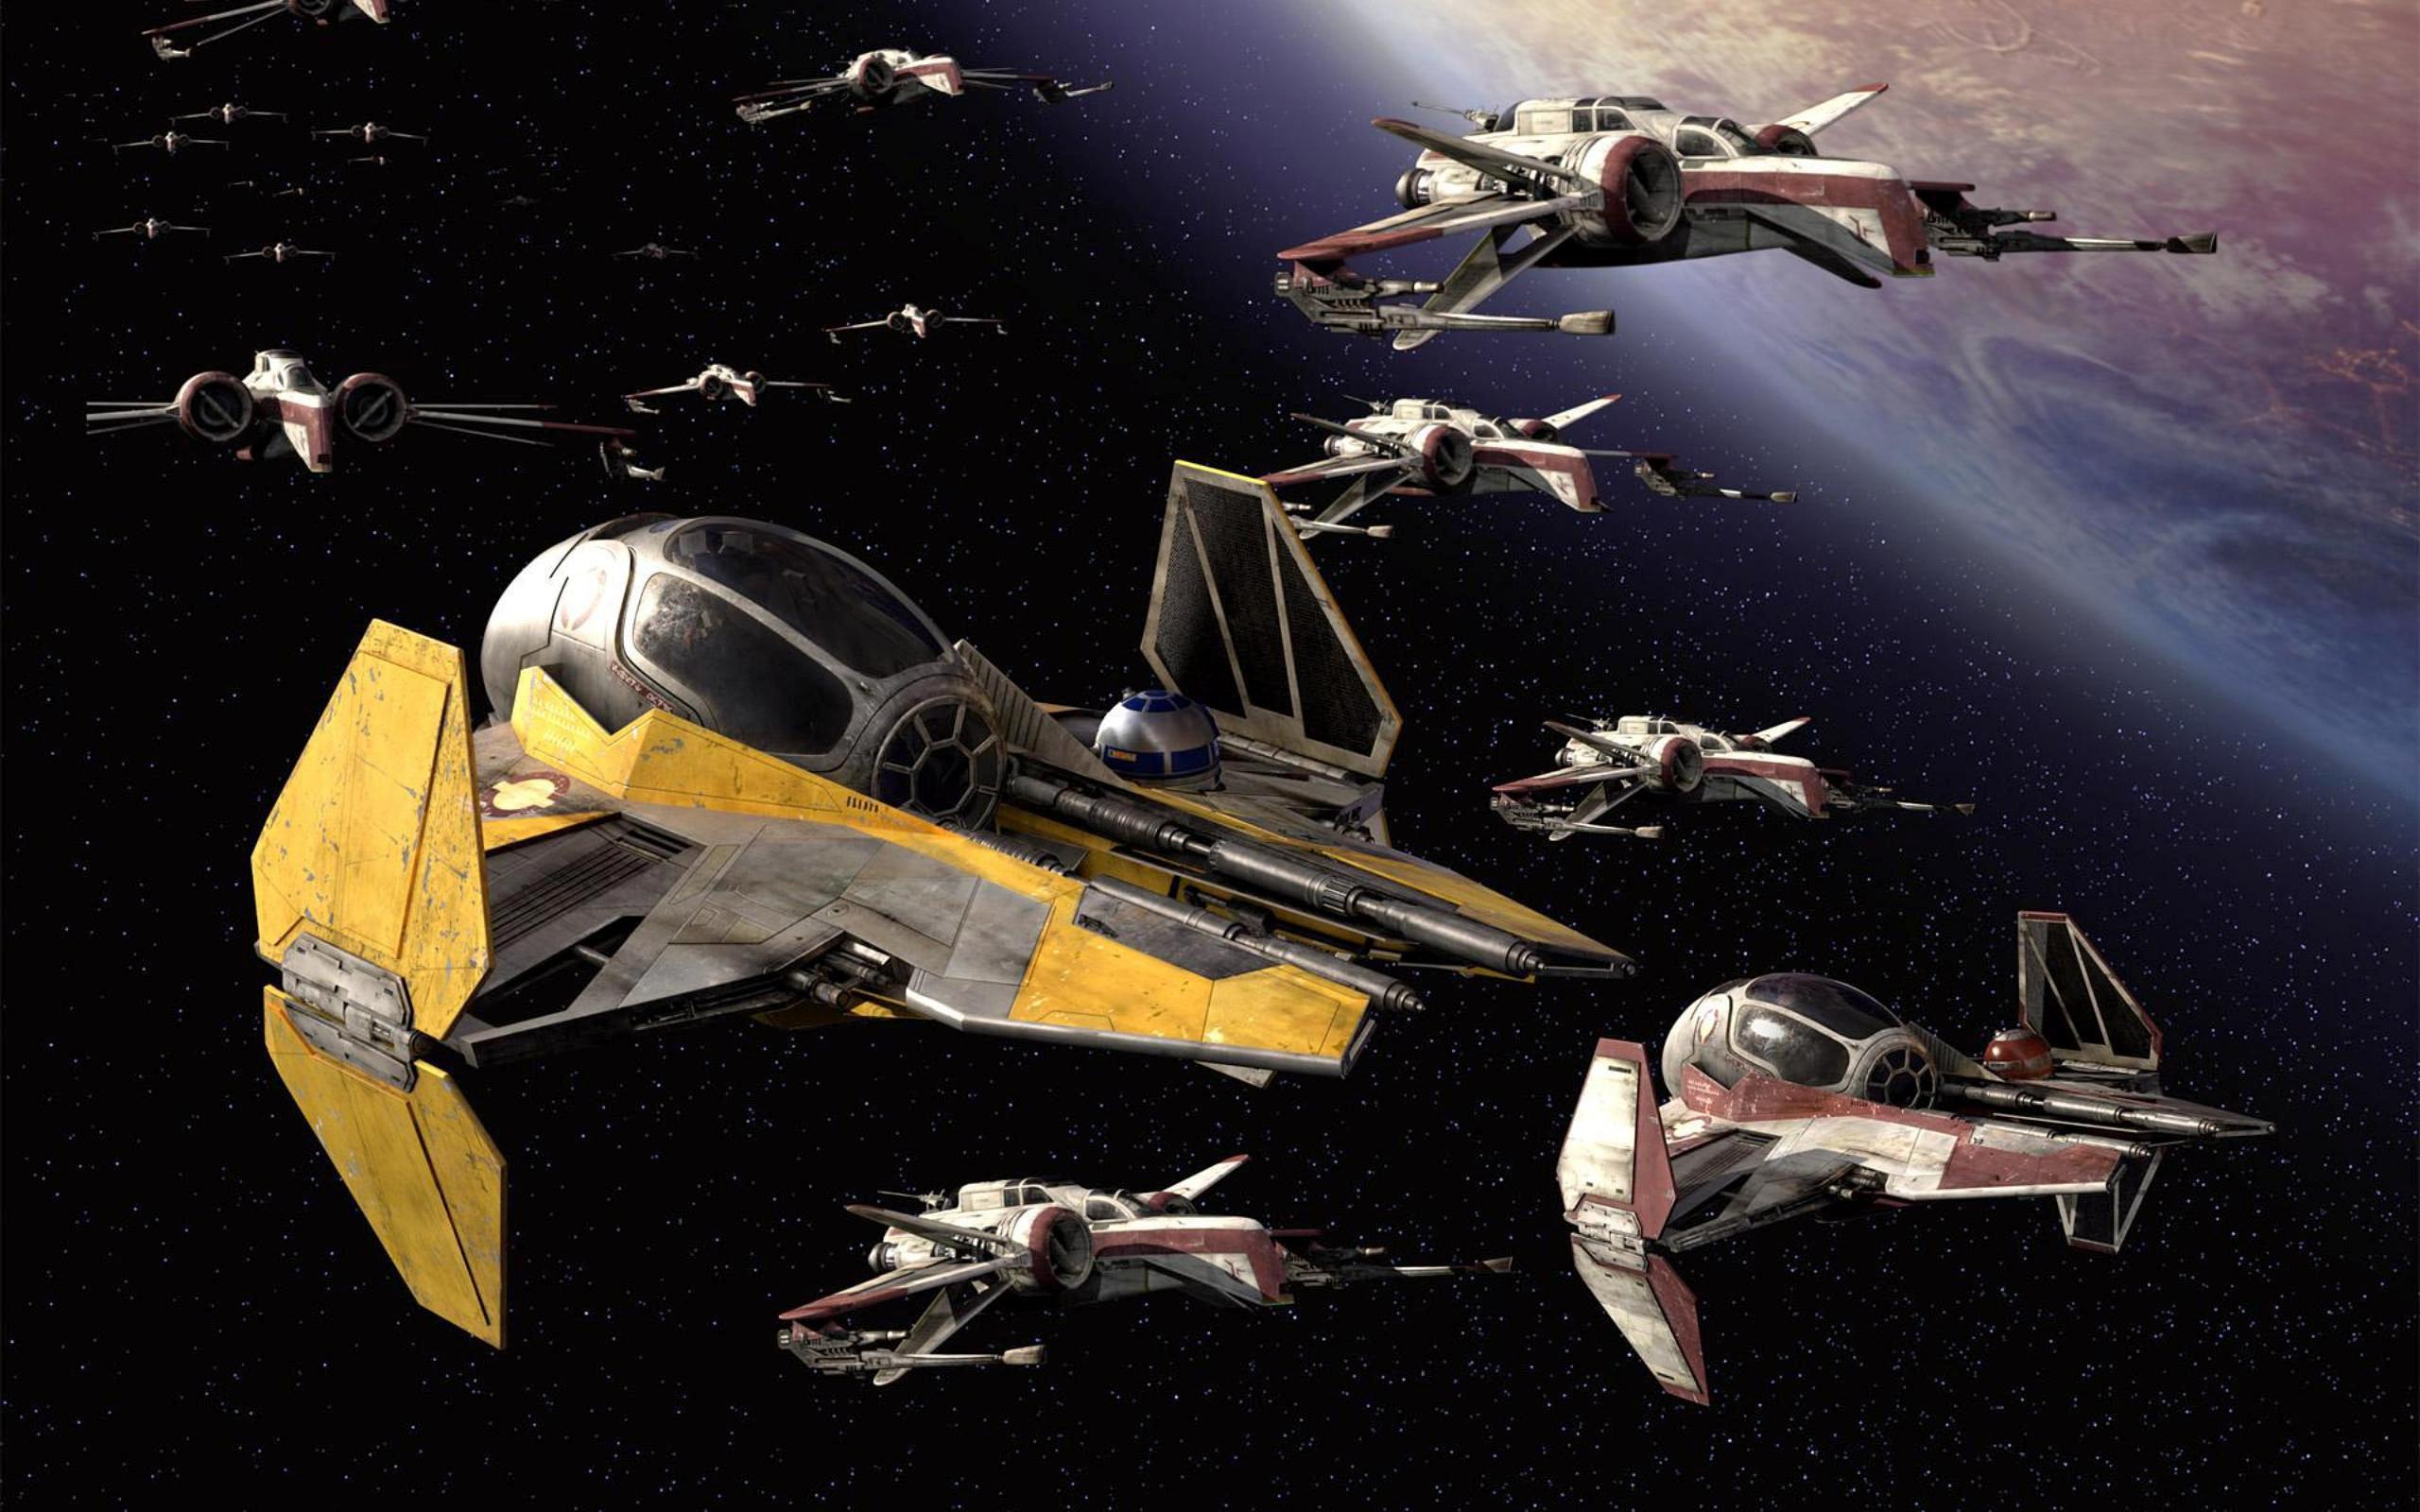 star wars wallpapers hd – Pesquisa Google